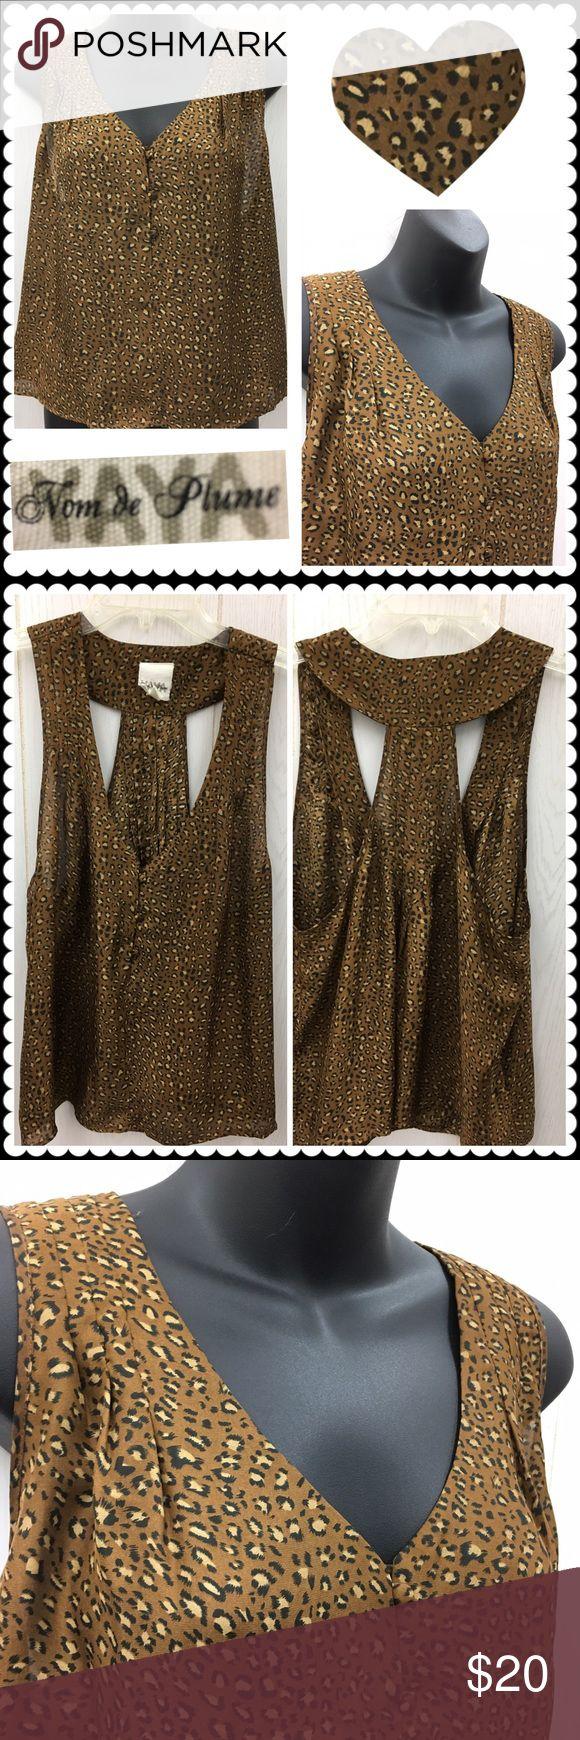 Animal print blouse by NOM de PLUME Sz Large Brown animal print sleeveless blouse by NOM de PLUME. Sz Large Urban Outfitters Tops Blouses